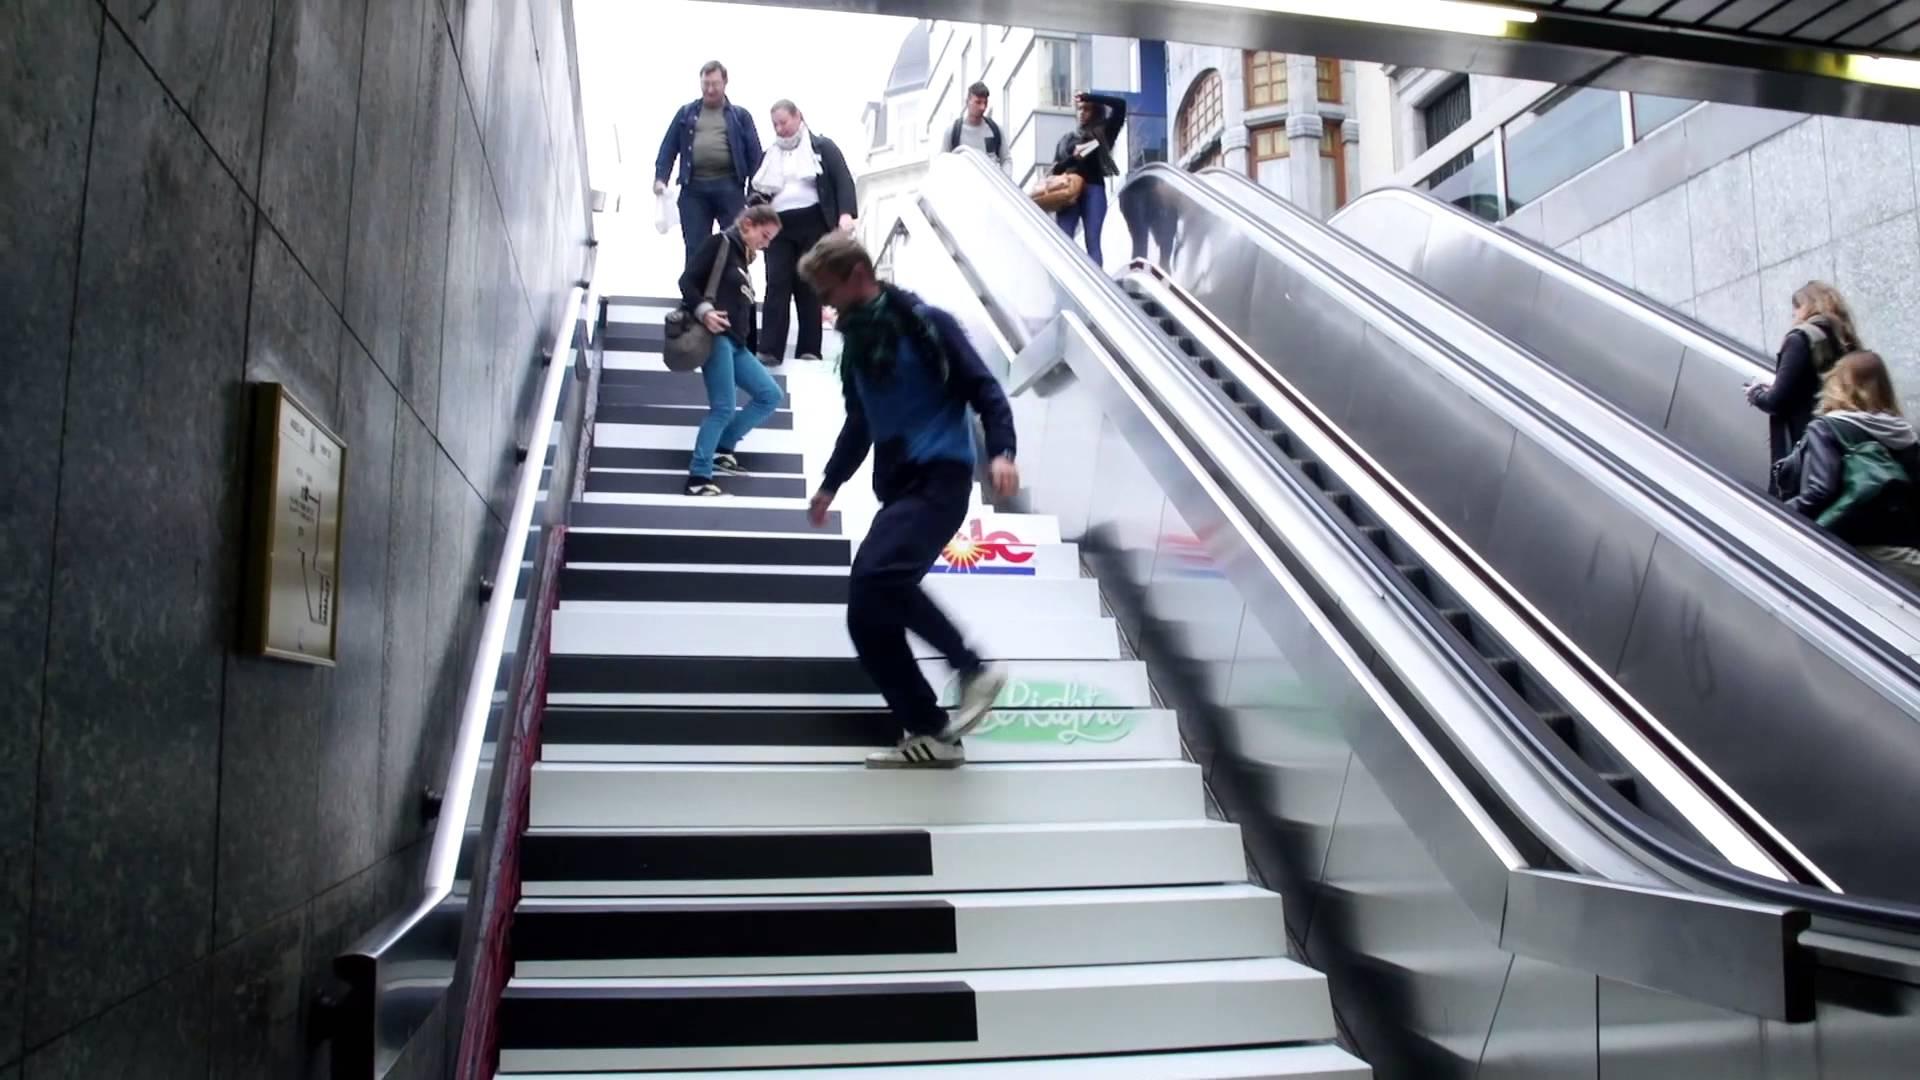 * Piano Stairs van Odenplan. Stockholm.